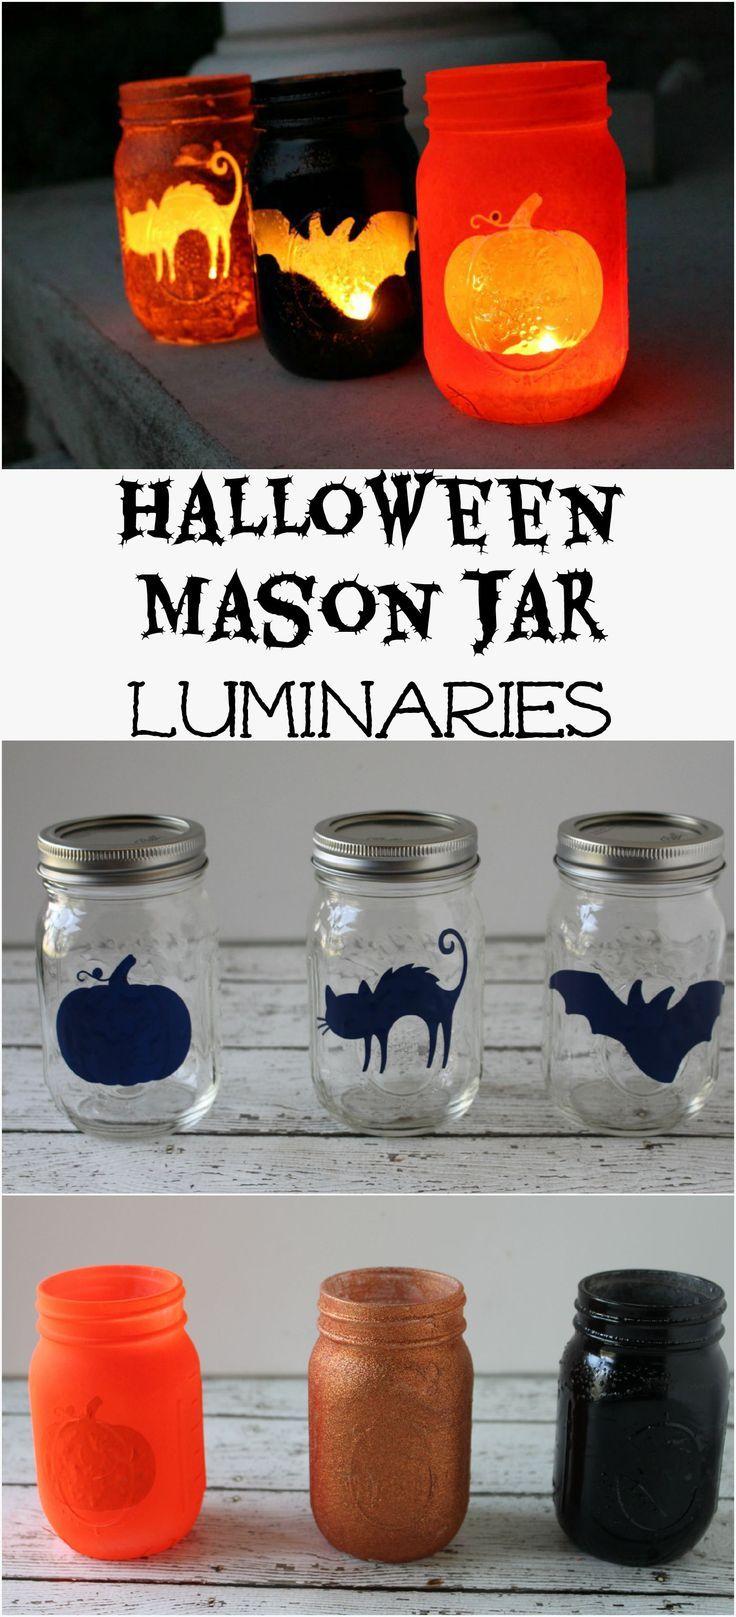 Halloween Mason Jar Luminaries - The EASIEST Halloween decoration - cute homemade halloween decorations